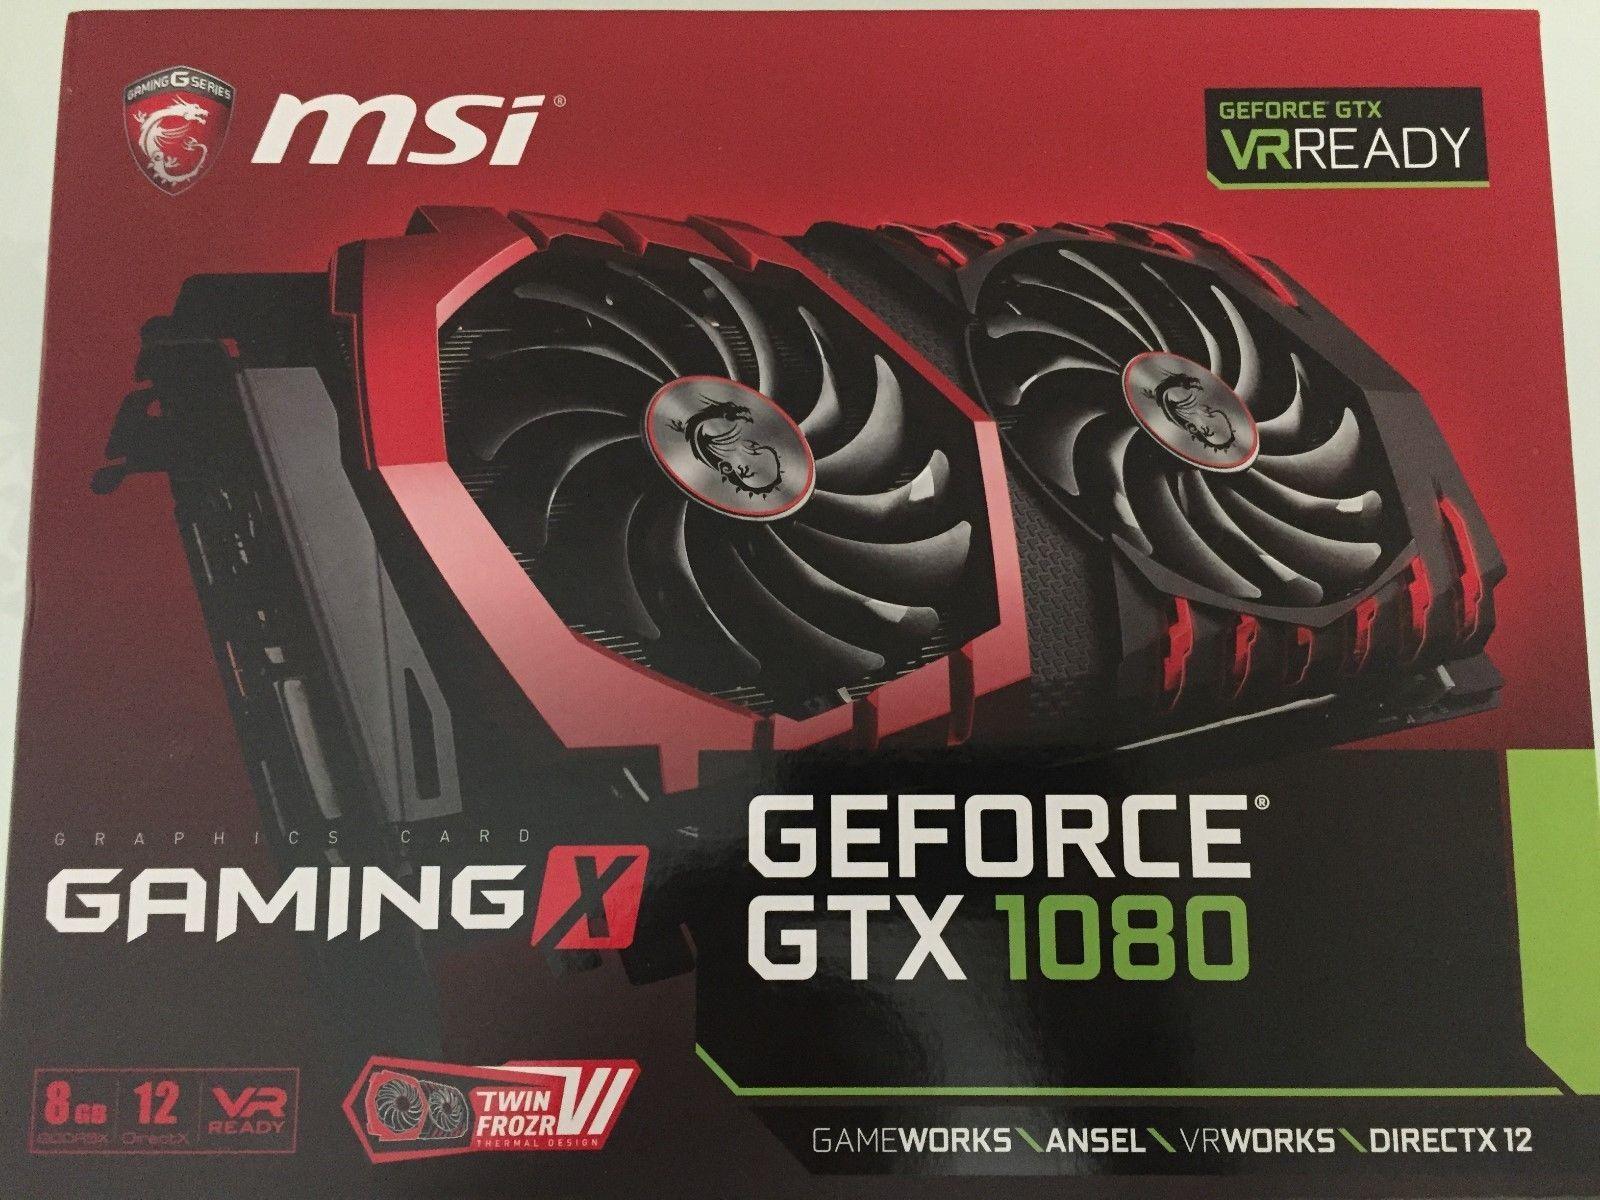 MSI GeForce GTX 1080 GAMING X 8GB DirectX 12 VR Ready Graphics Card